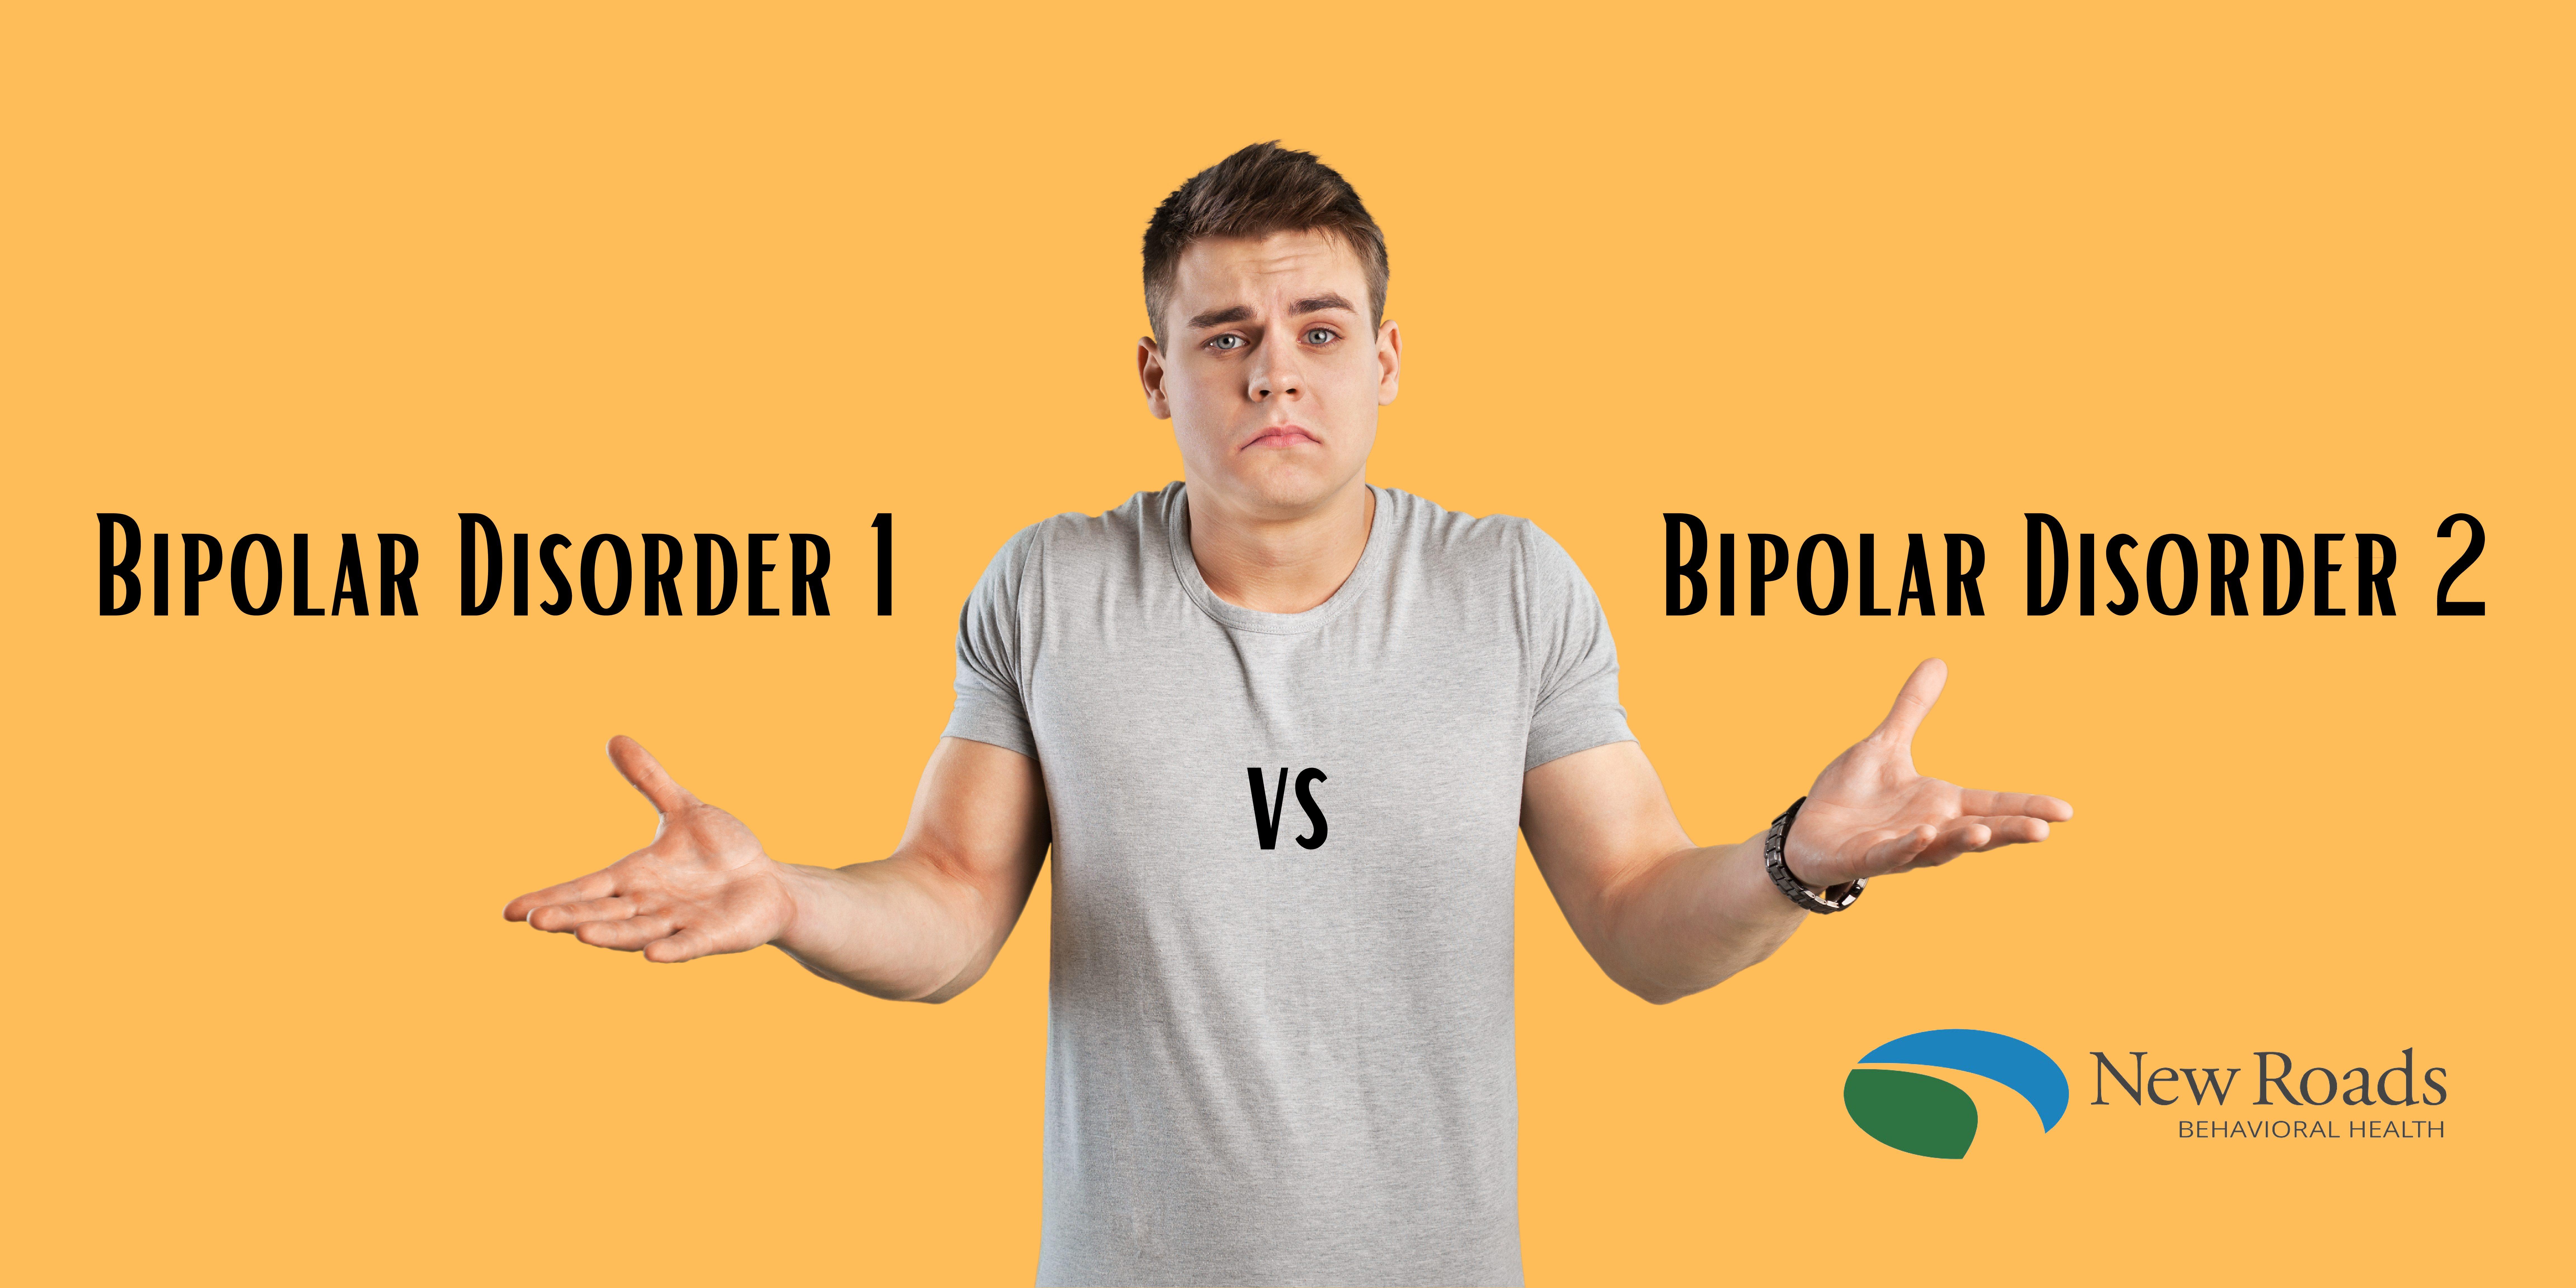 Bipolar Disorder 1 vs Bipolar Disorder 2